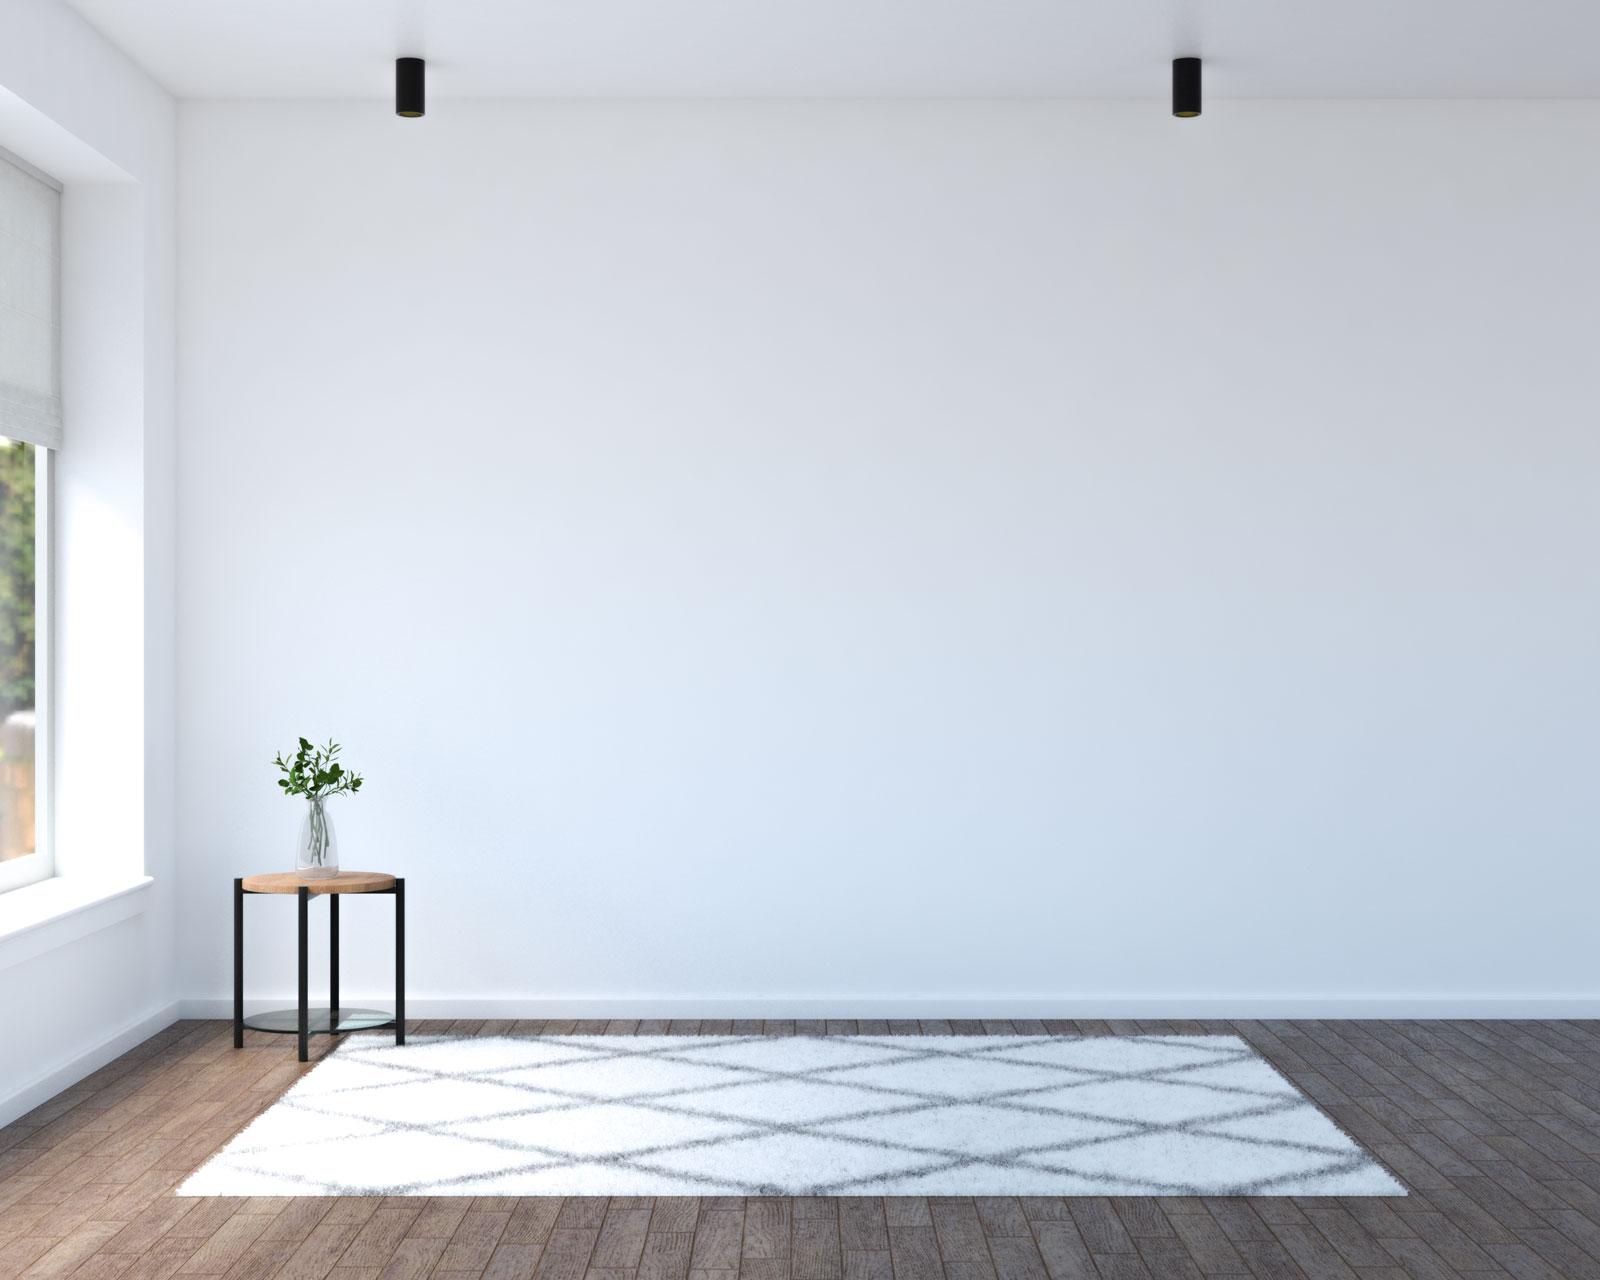 White geometric area rug